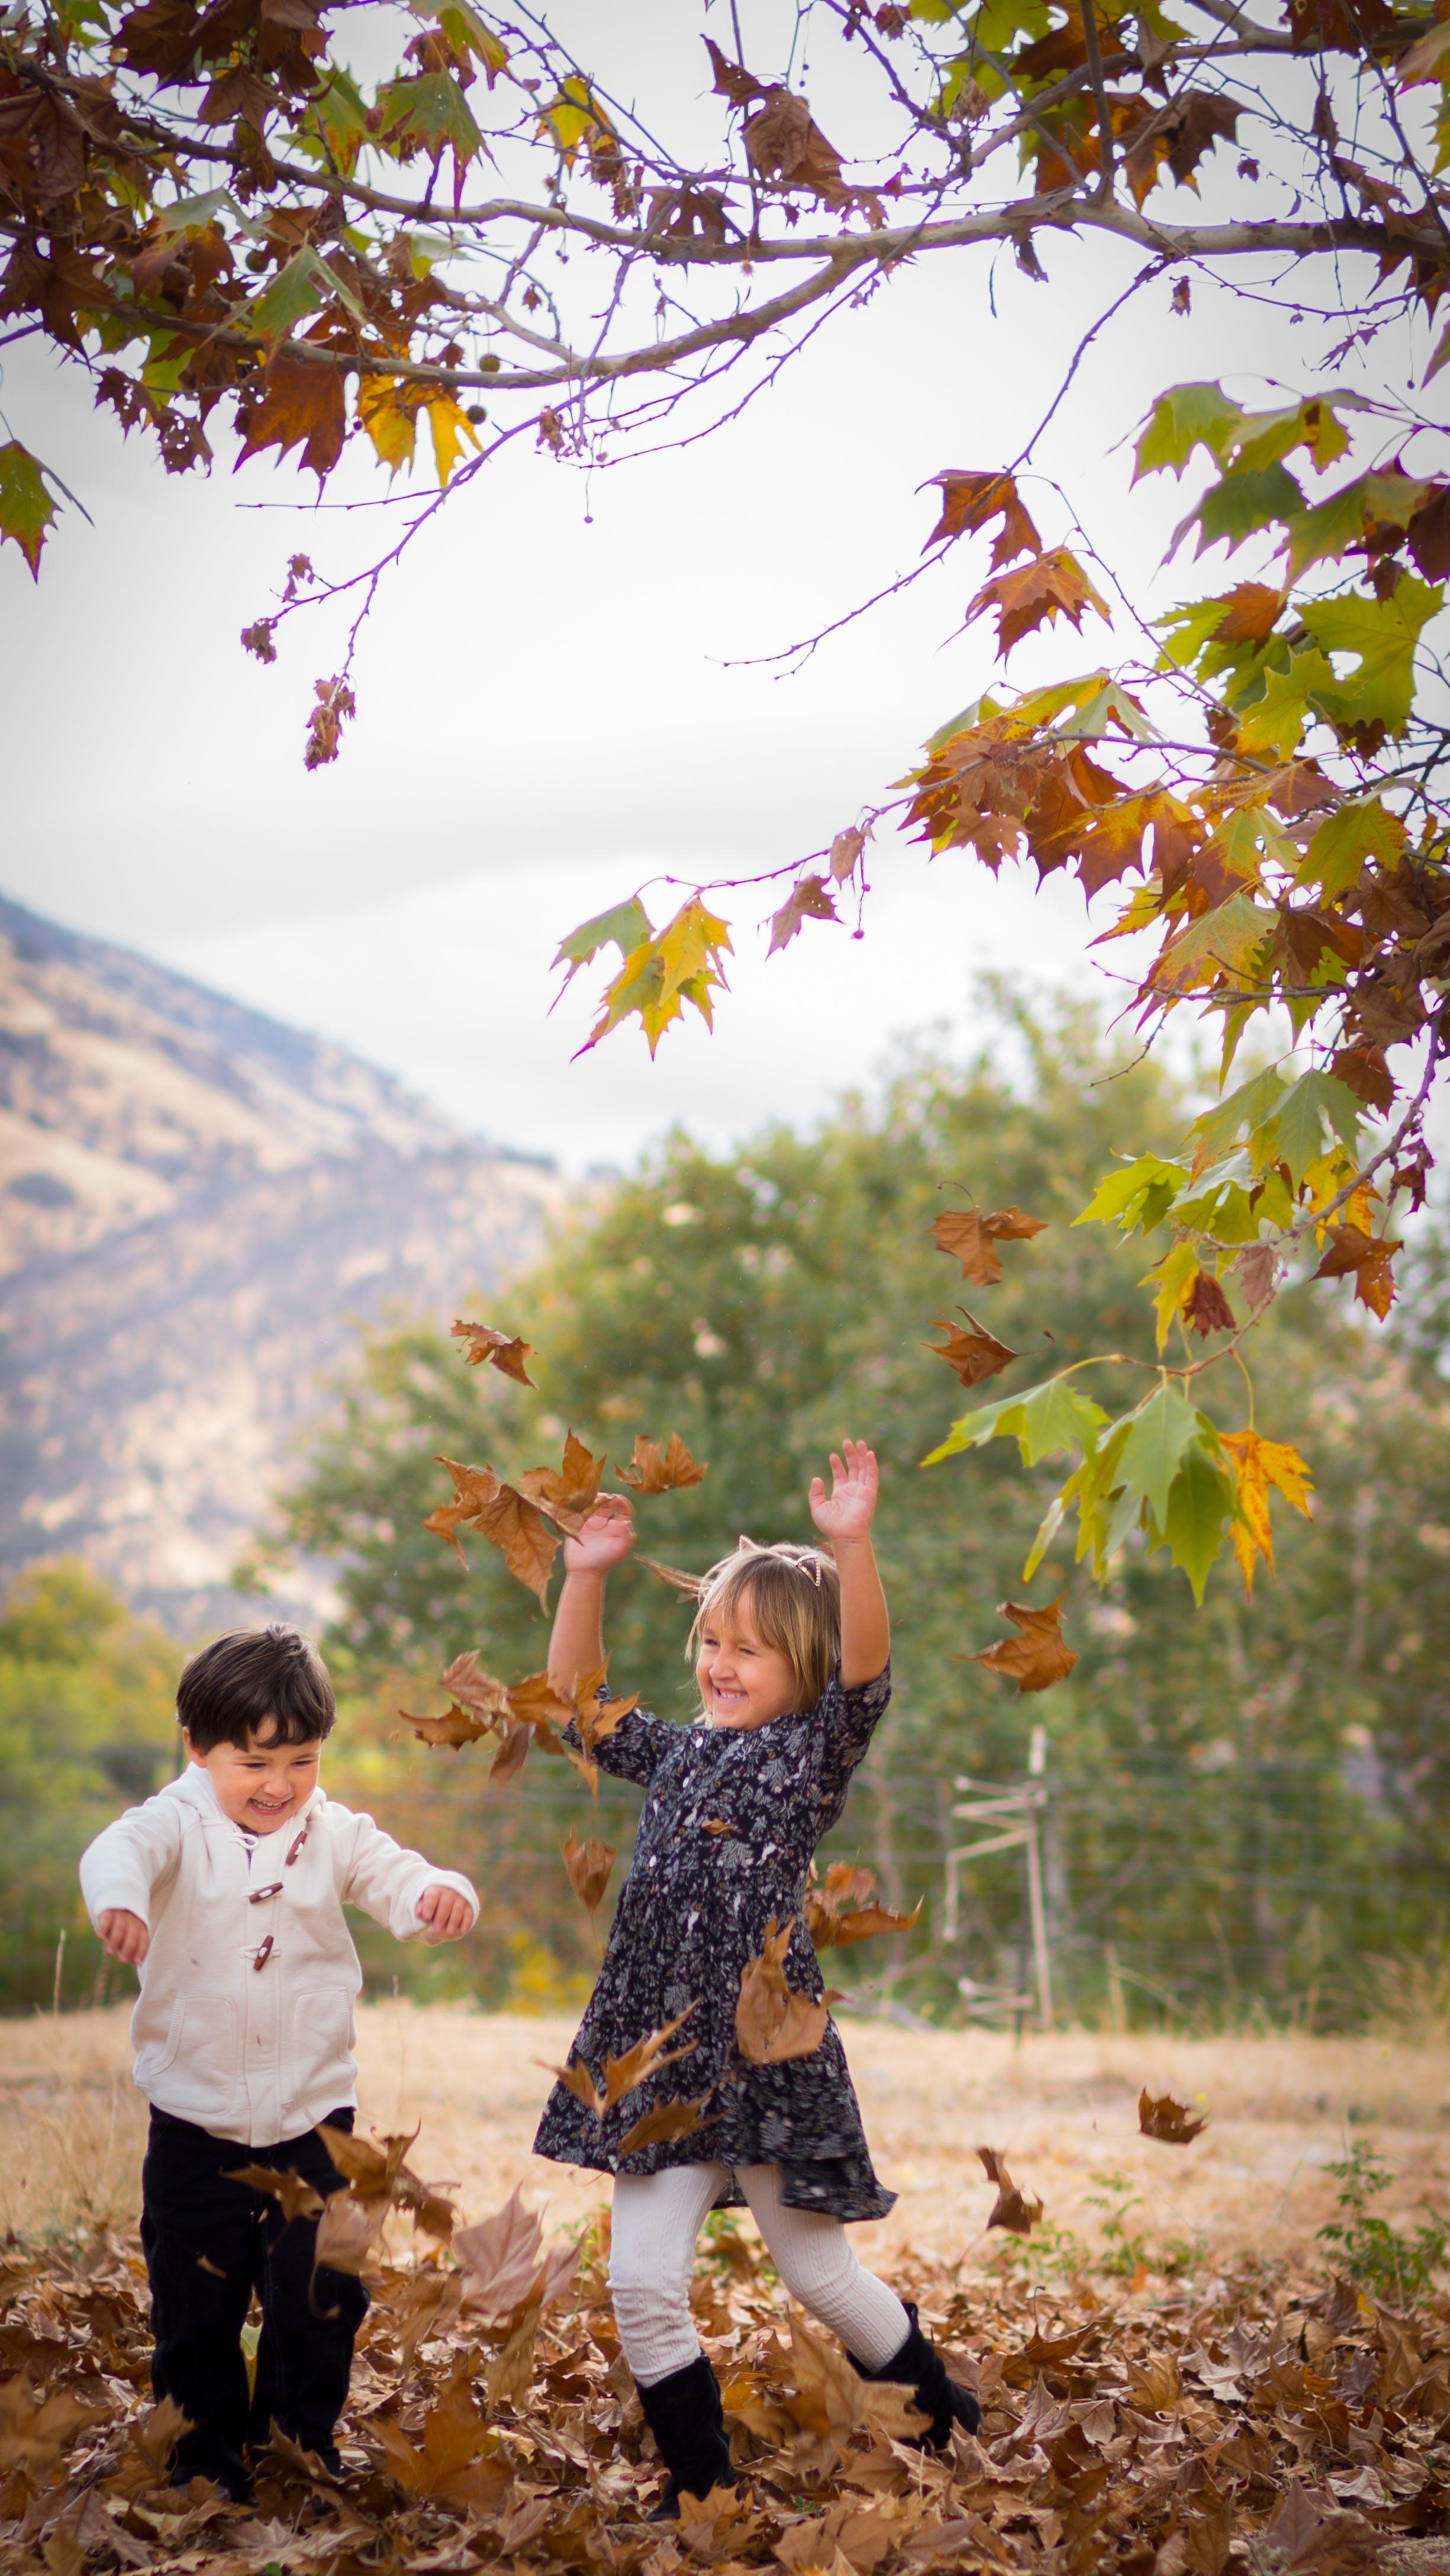 Free stock photo of autumn, autumn colours, autumn leaves, autumnal